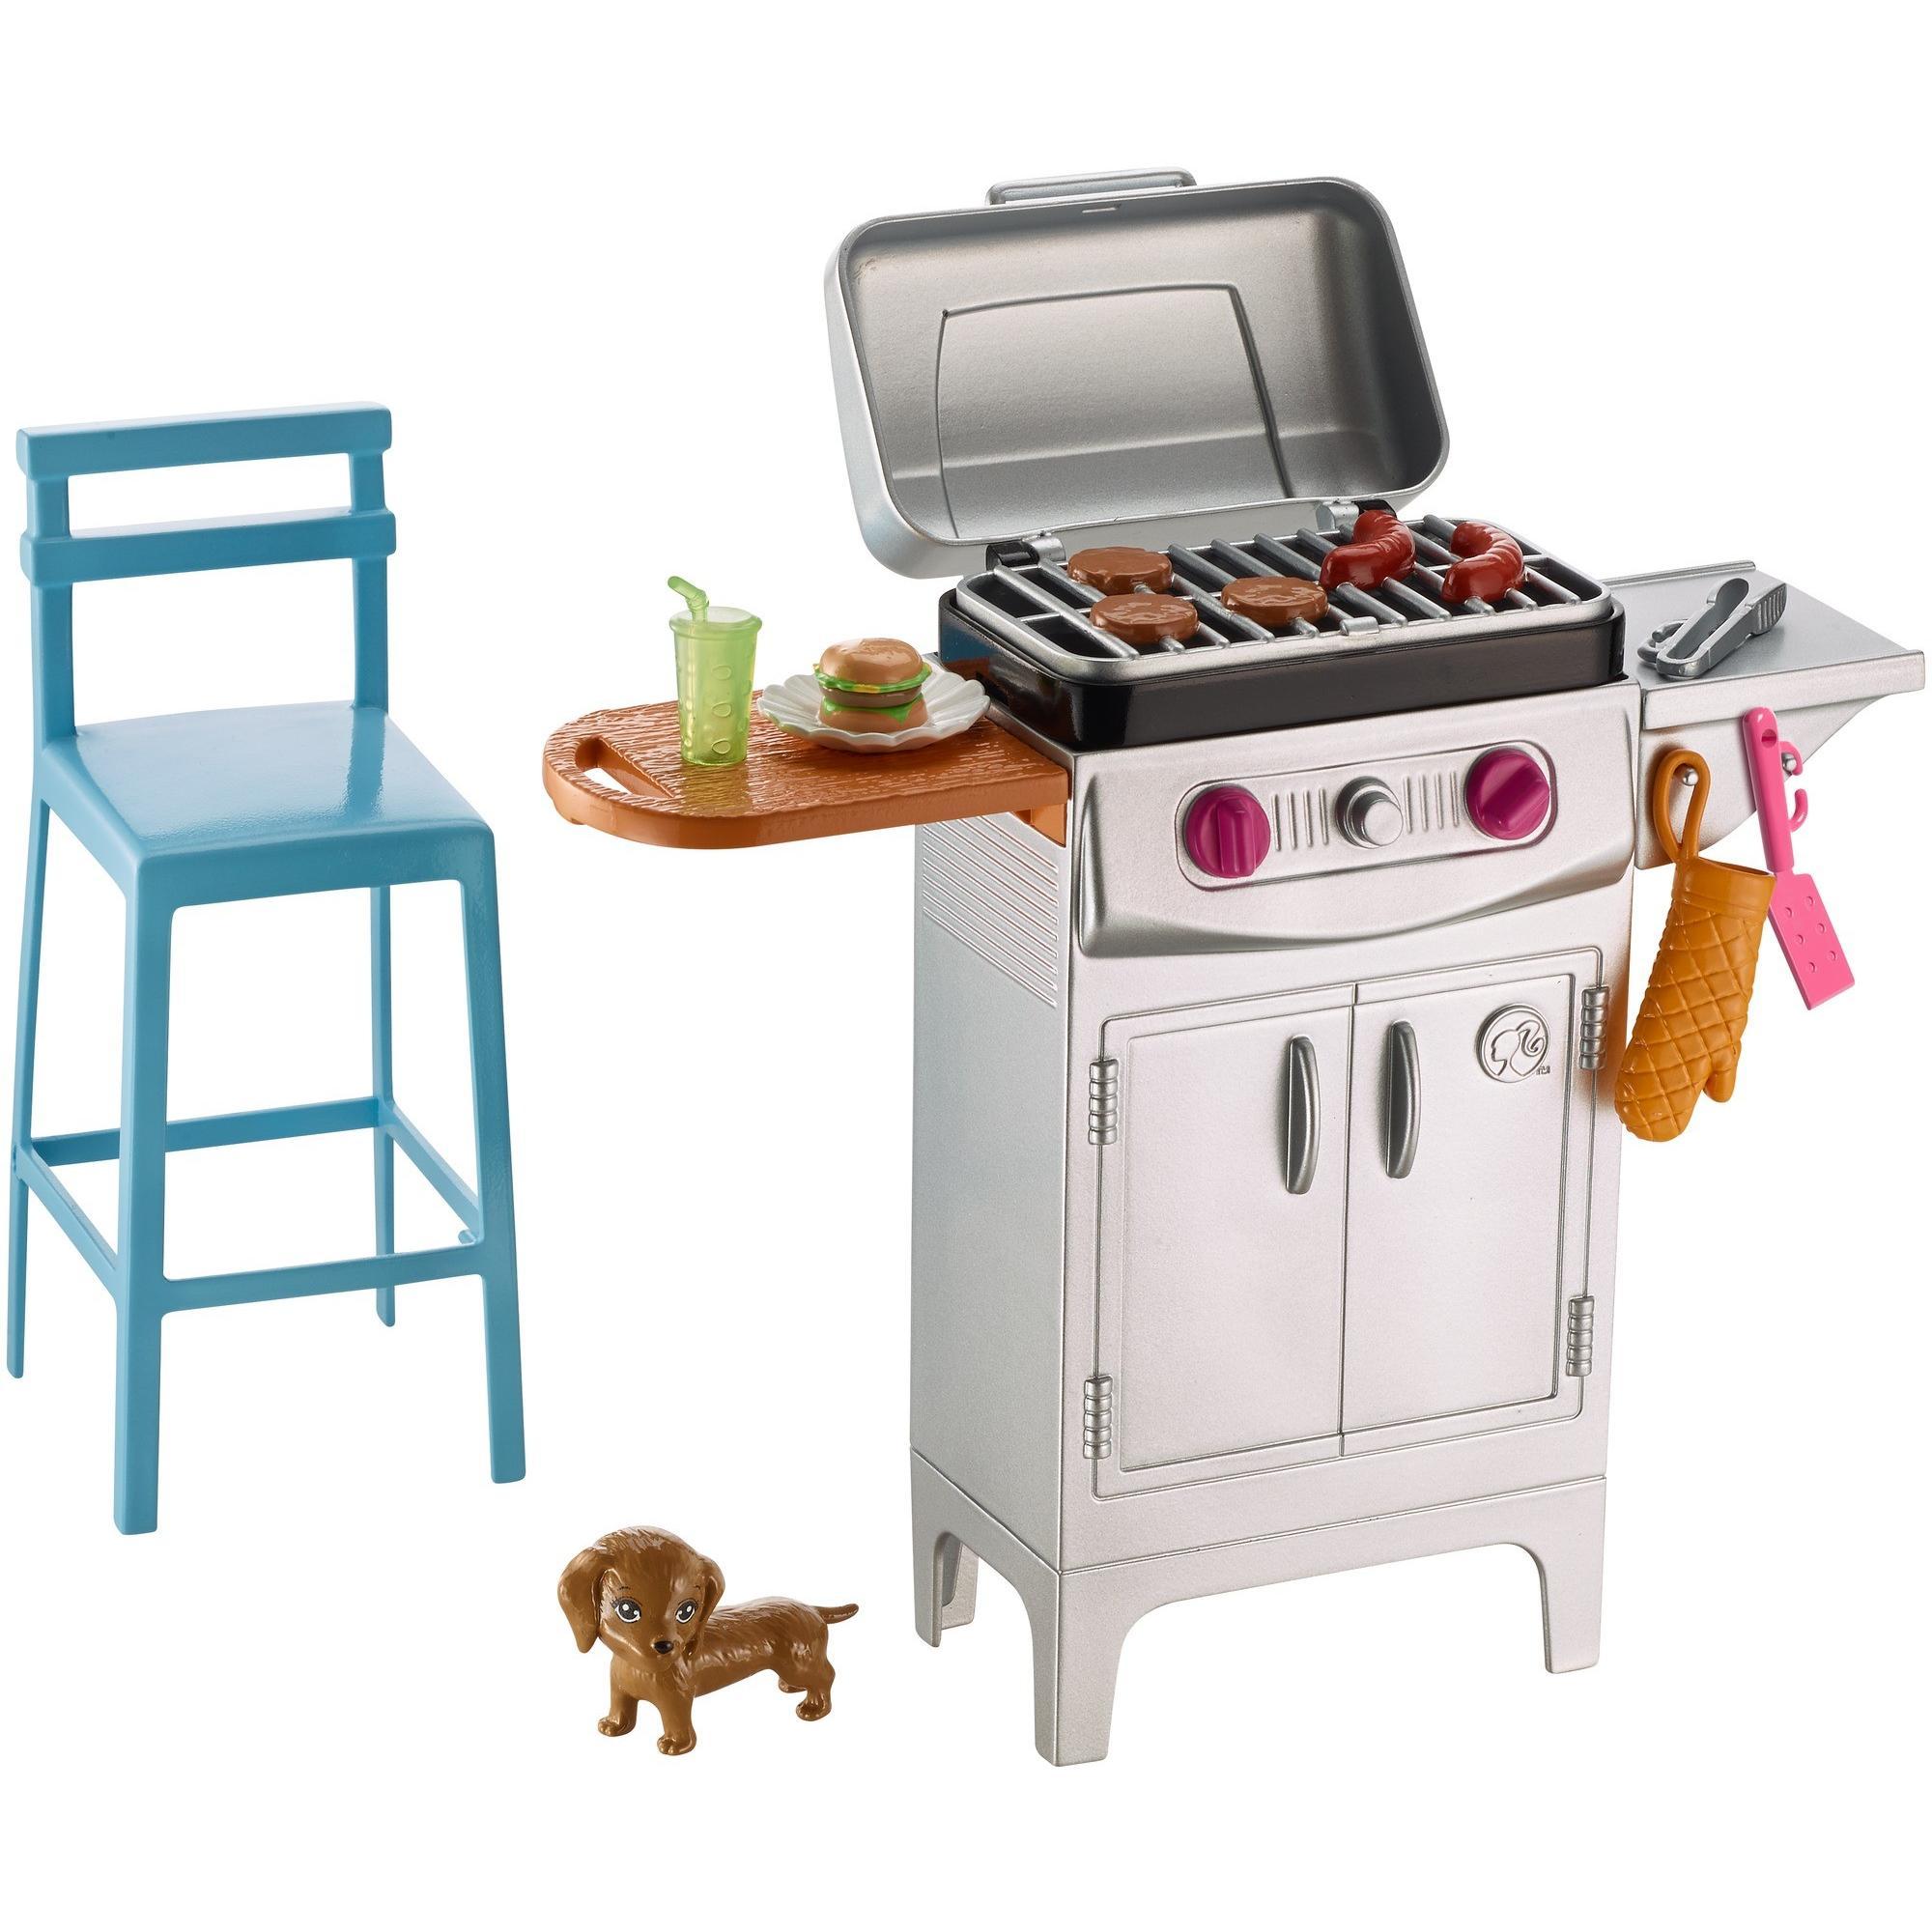 Barbie Furniture & Accessories BBQ Grill by MATTEL INC.